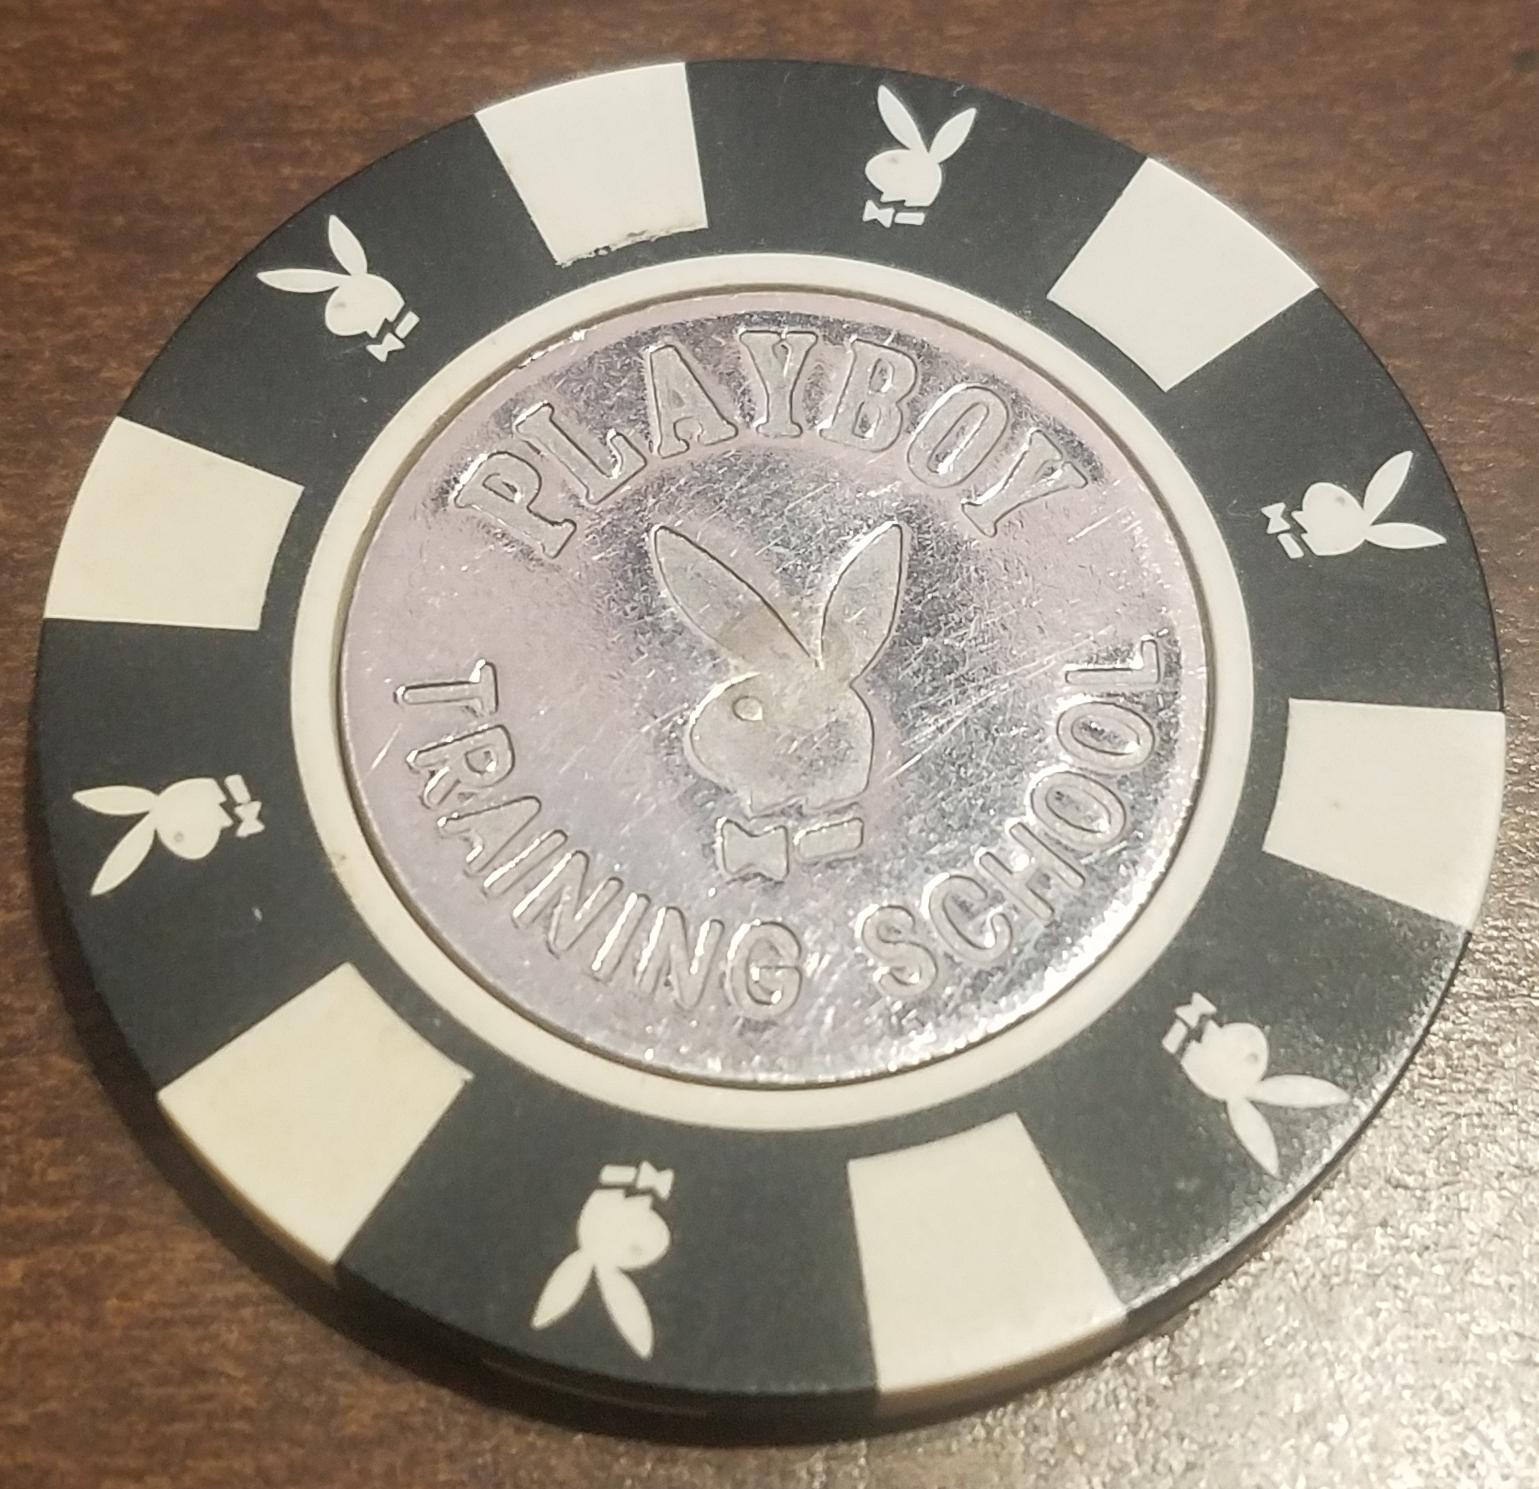 Playboy club bahamas training chip